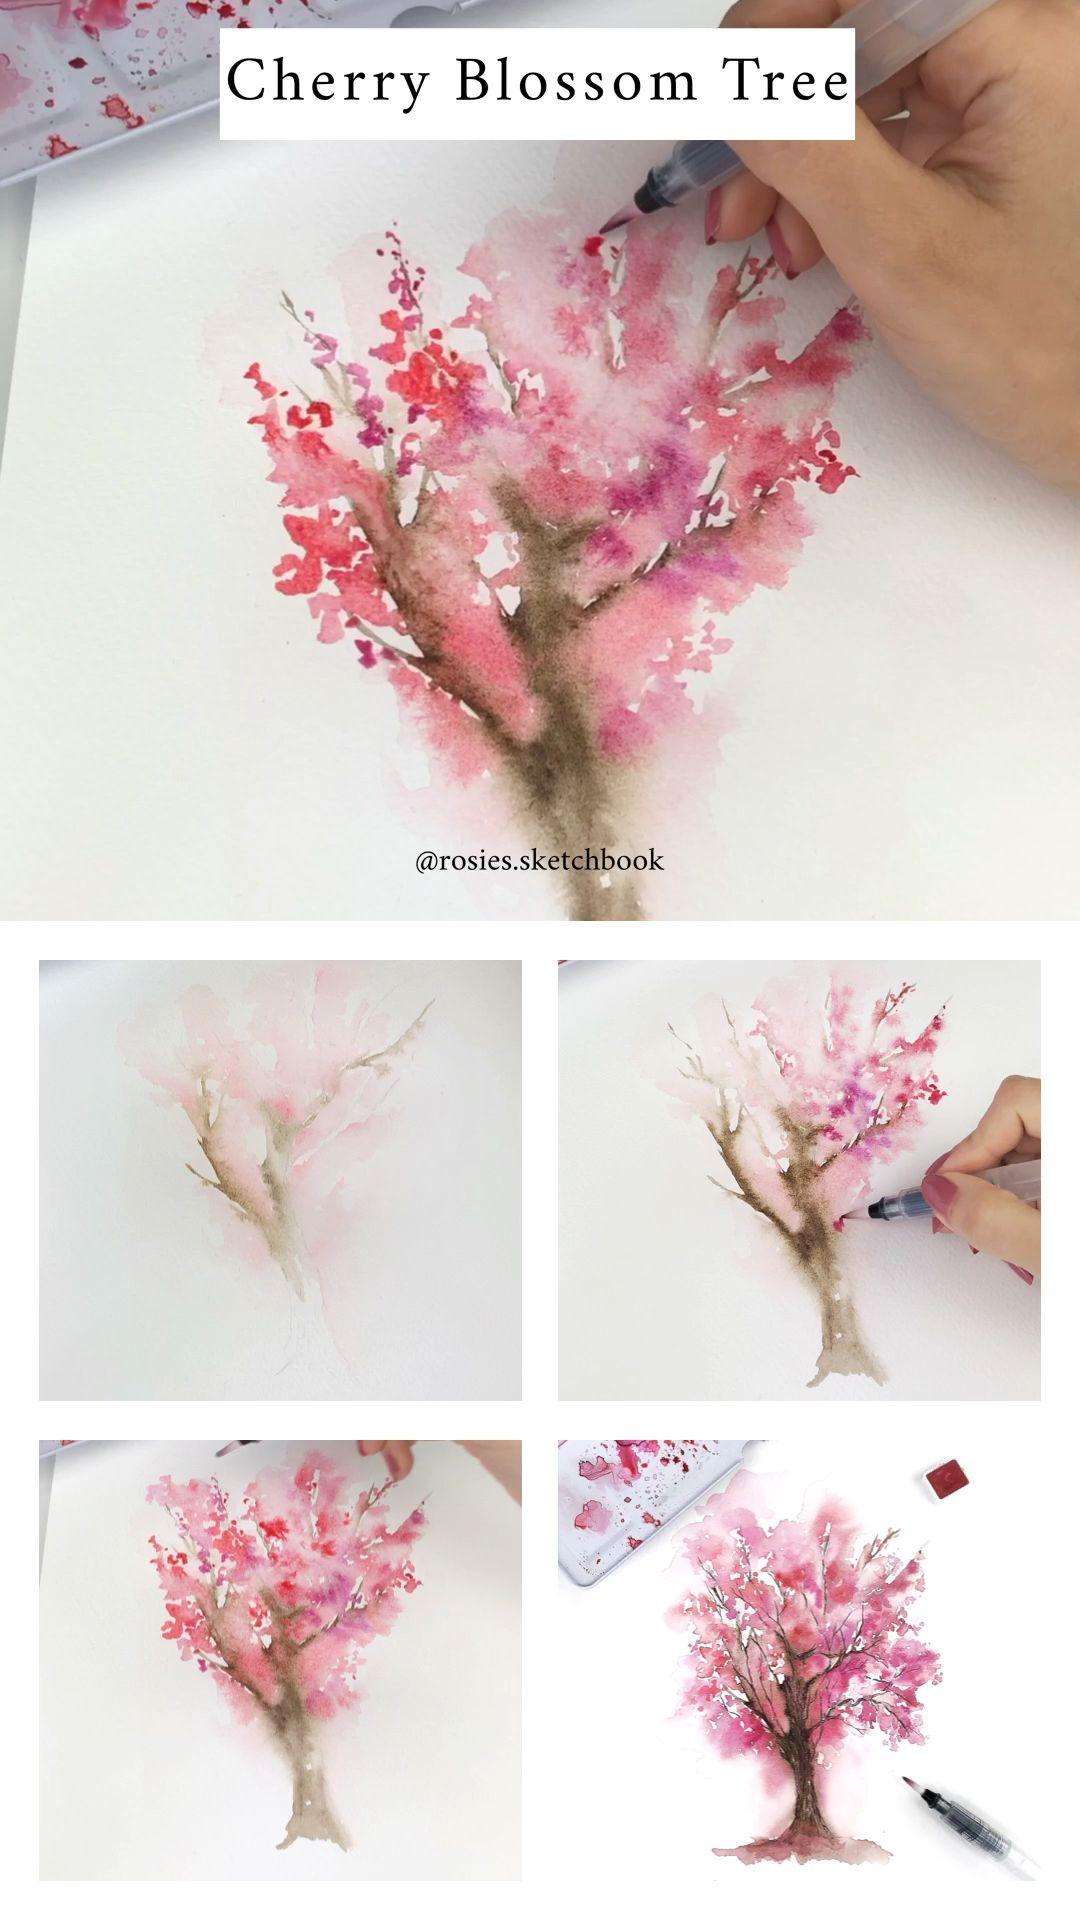 Cherry Blossom Sakura Trees Paper Invitations Announcements Printed Cherry Blossom Tree Tattoo Cherry Blossom Drawing Cherry Blossom Painting